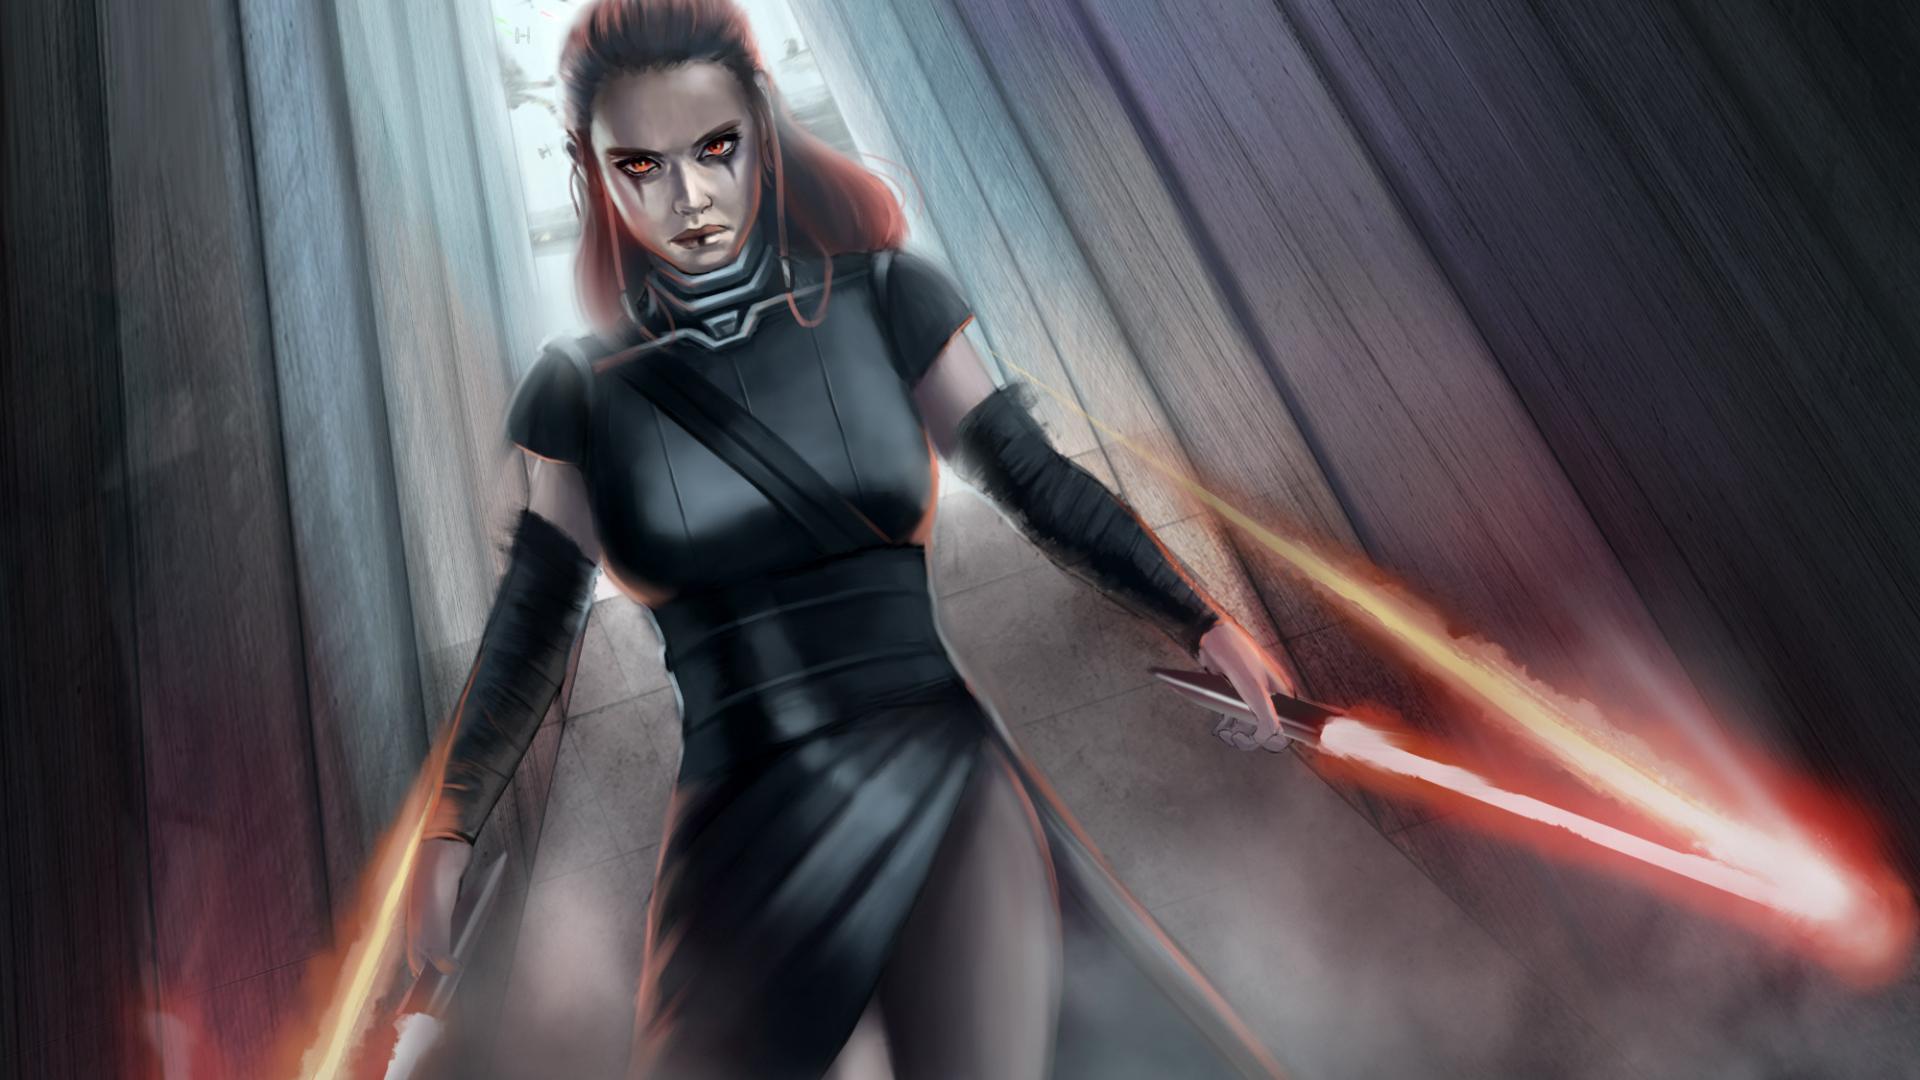 Desktop Wallpaper Rey Star Wars Art Hd Image Picture Background 4f81ab